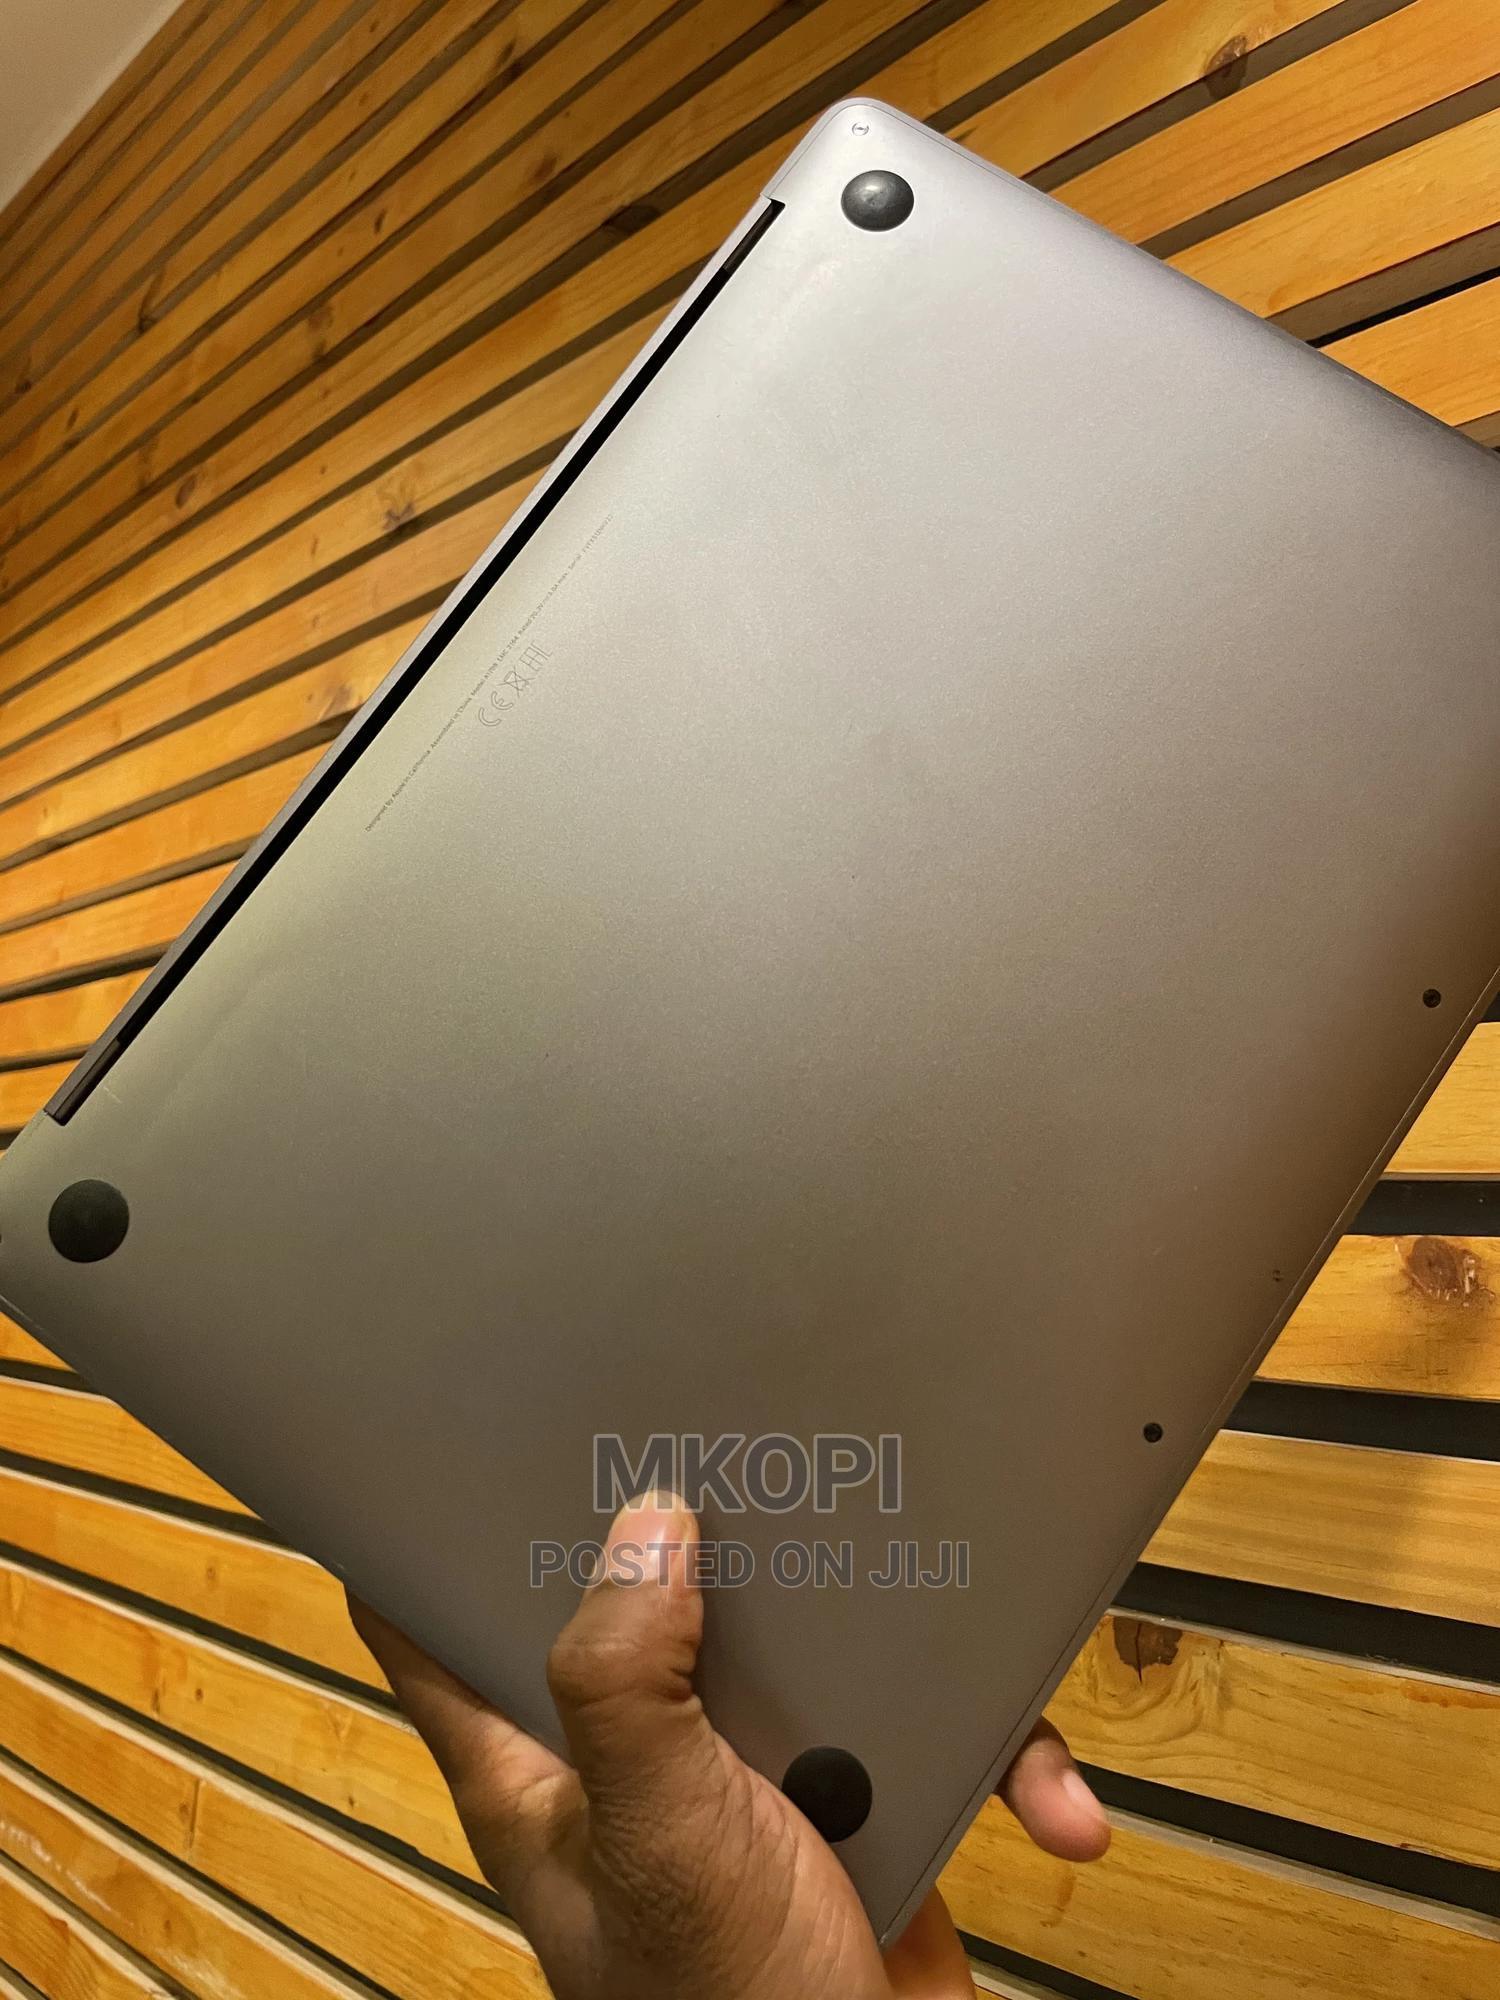 Laptop Apple MacBook Pro 2017 8GB Intel Core I5 SSD 256GB | Laptops & Computers for sale in Kinondoni, Dar es Salaam, Tanzania